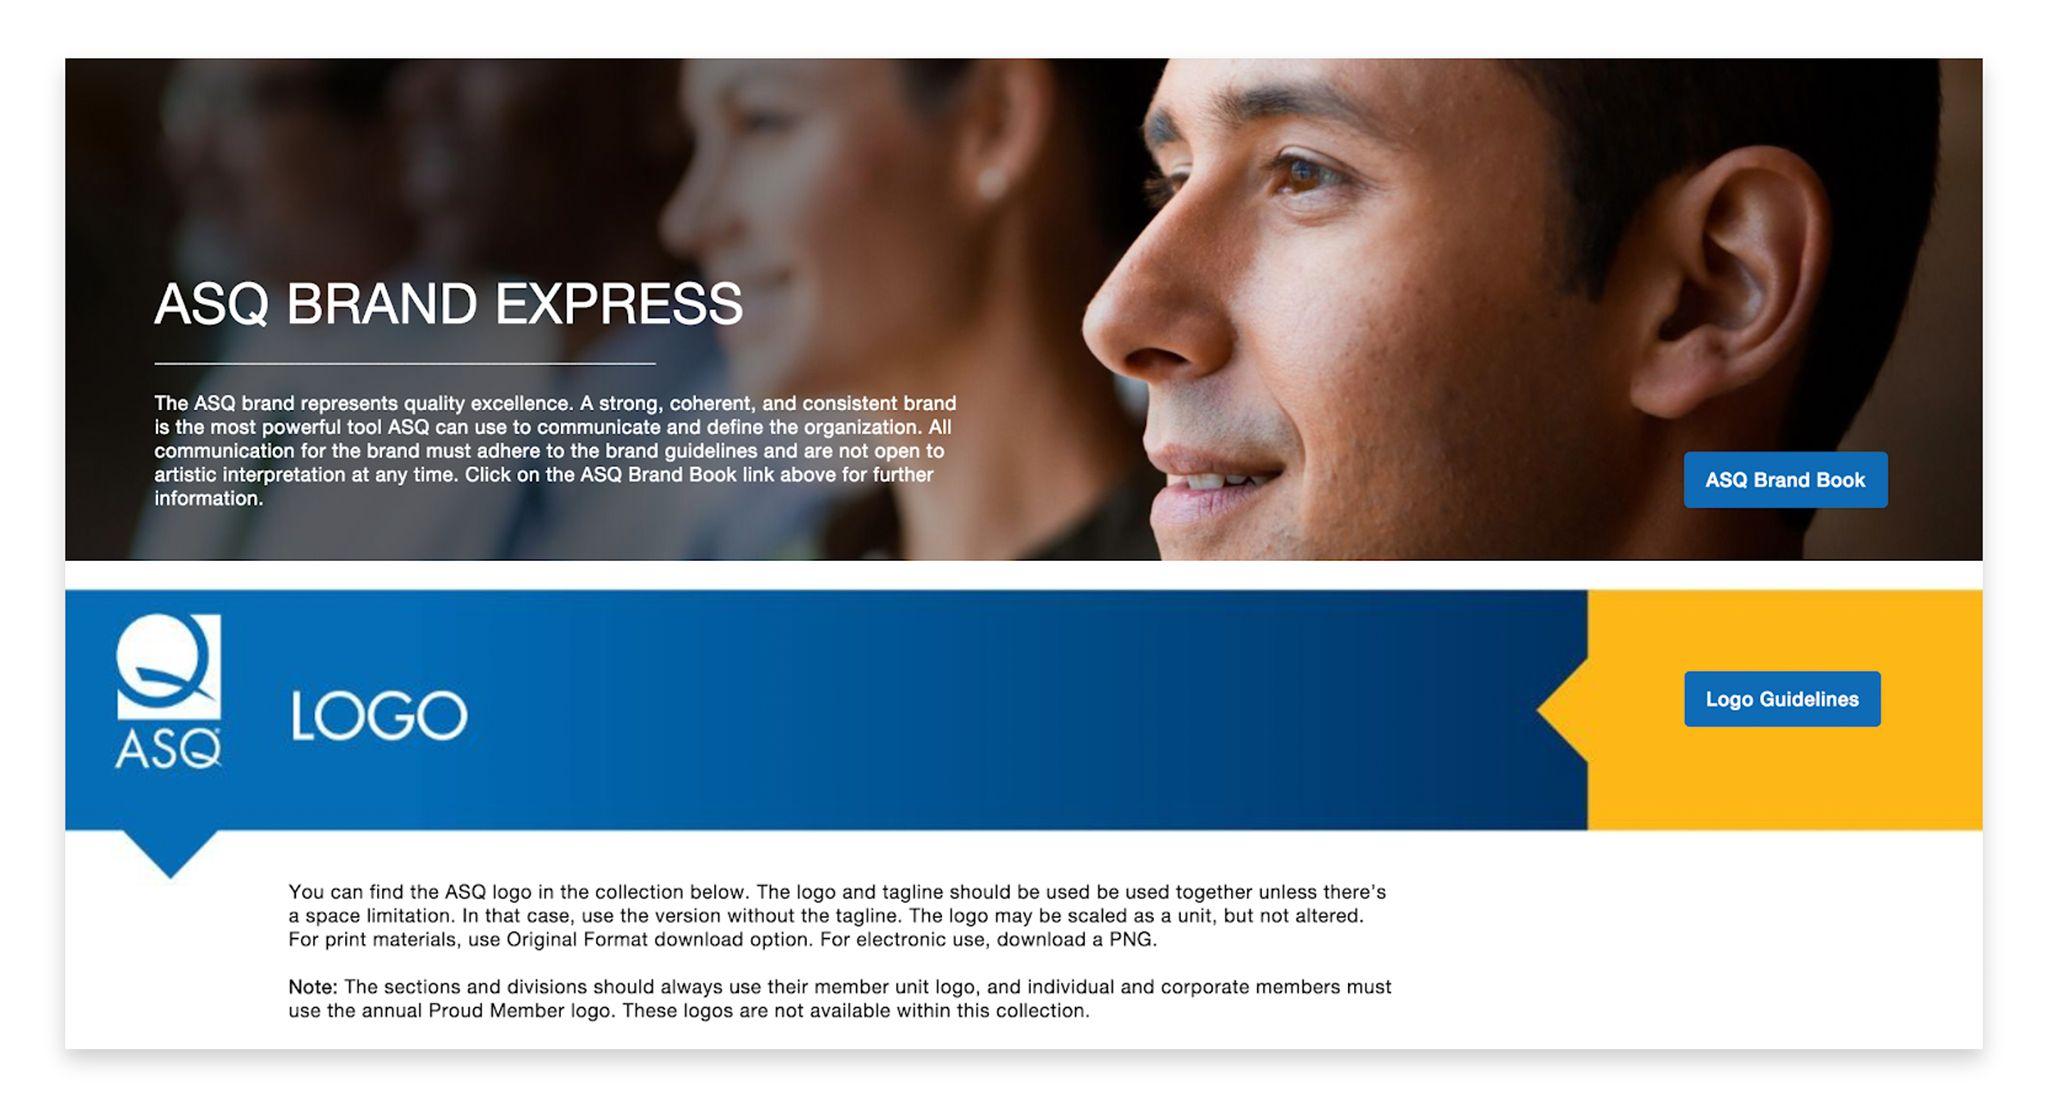 ASQ Brand Express Portal